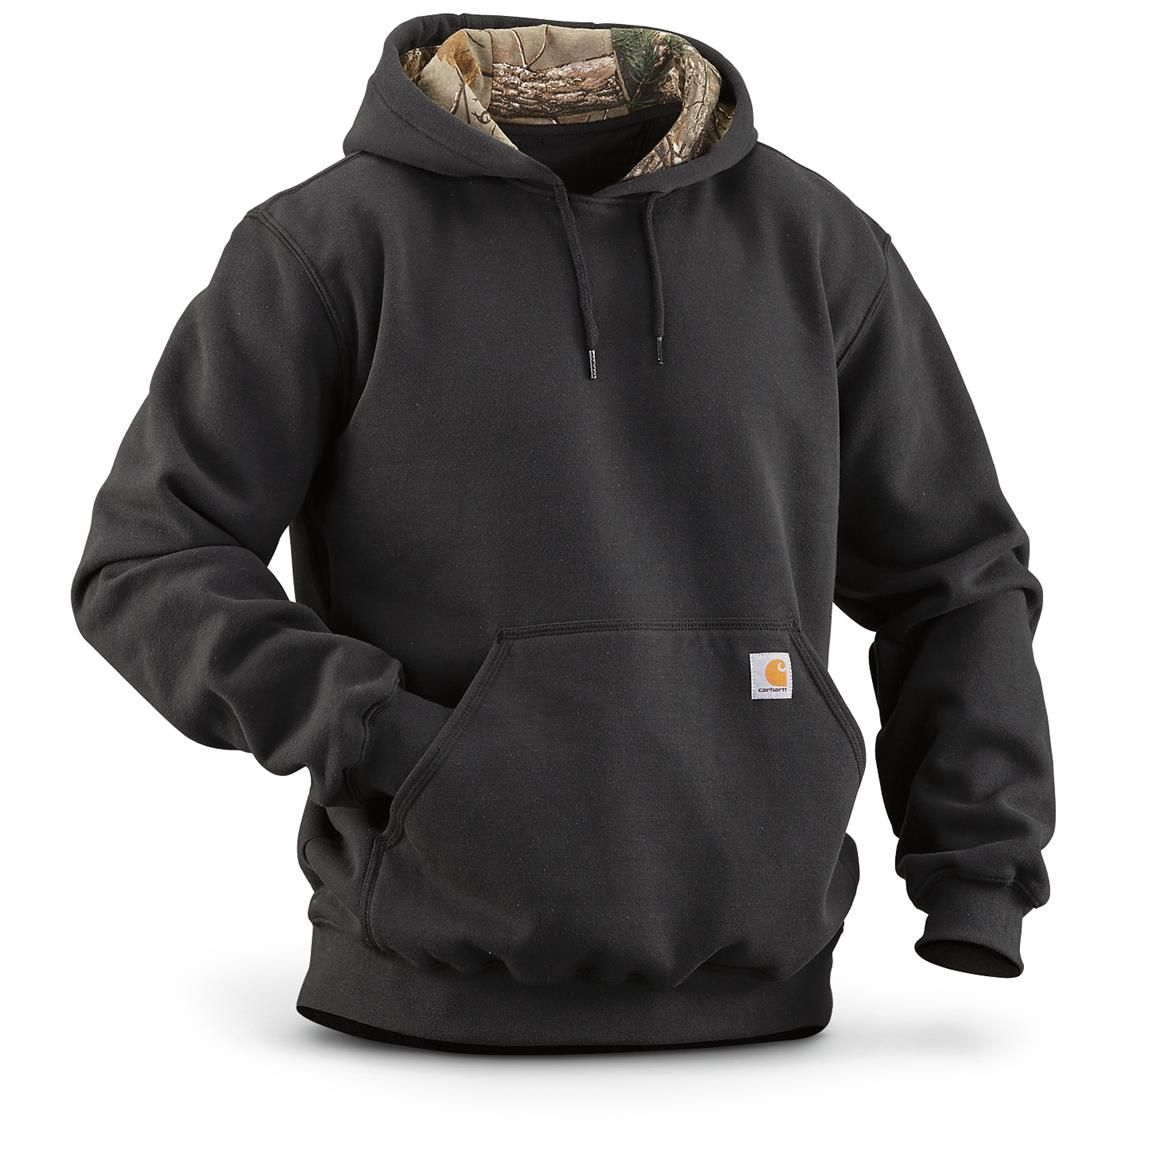 Carhartt Houghton Camo Hoodie Sweathshirt 635655 Sweatshirts Hoodies At Sportsman S Guide Mens Sweatshirts Mens Outfits North Face Jacket Mens [ 1155 x 1155 Pixel ]